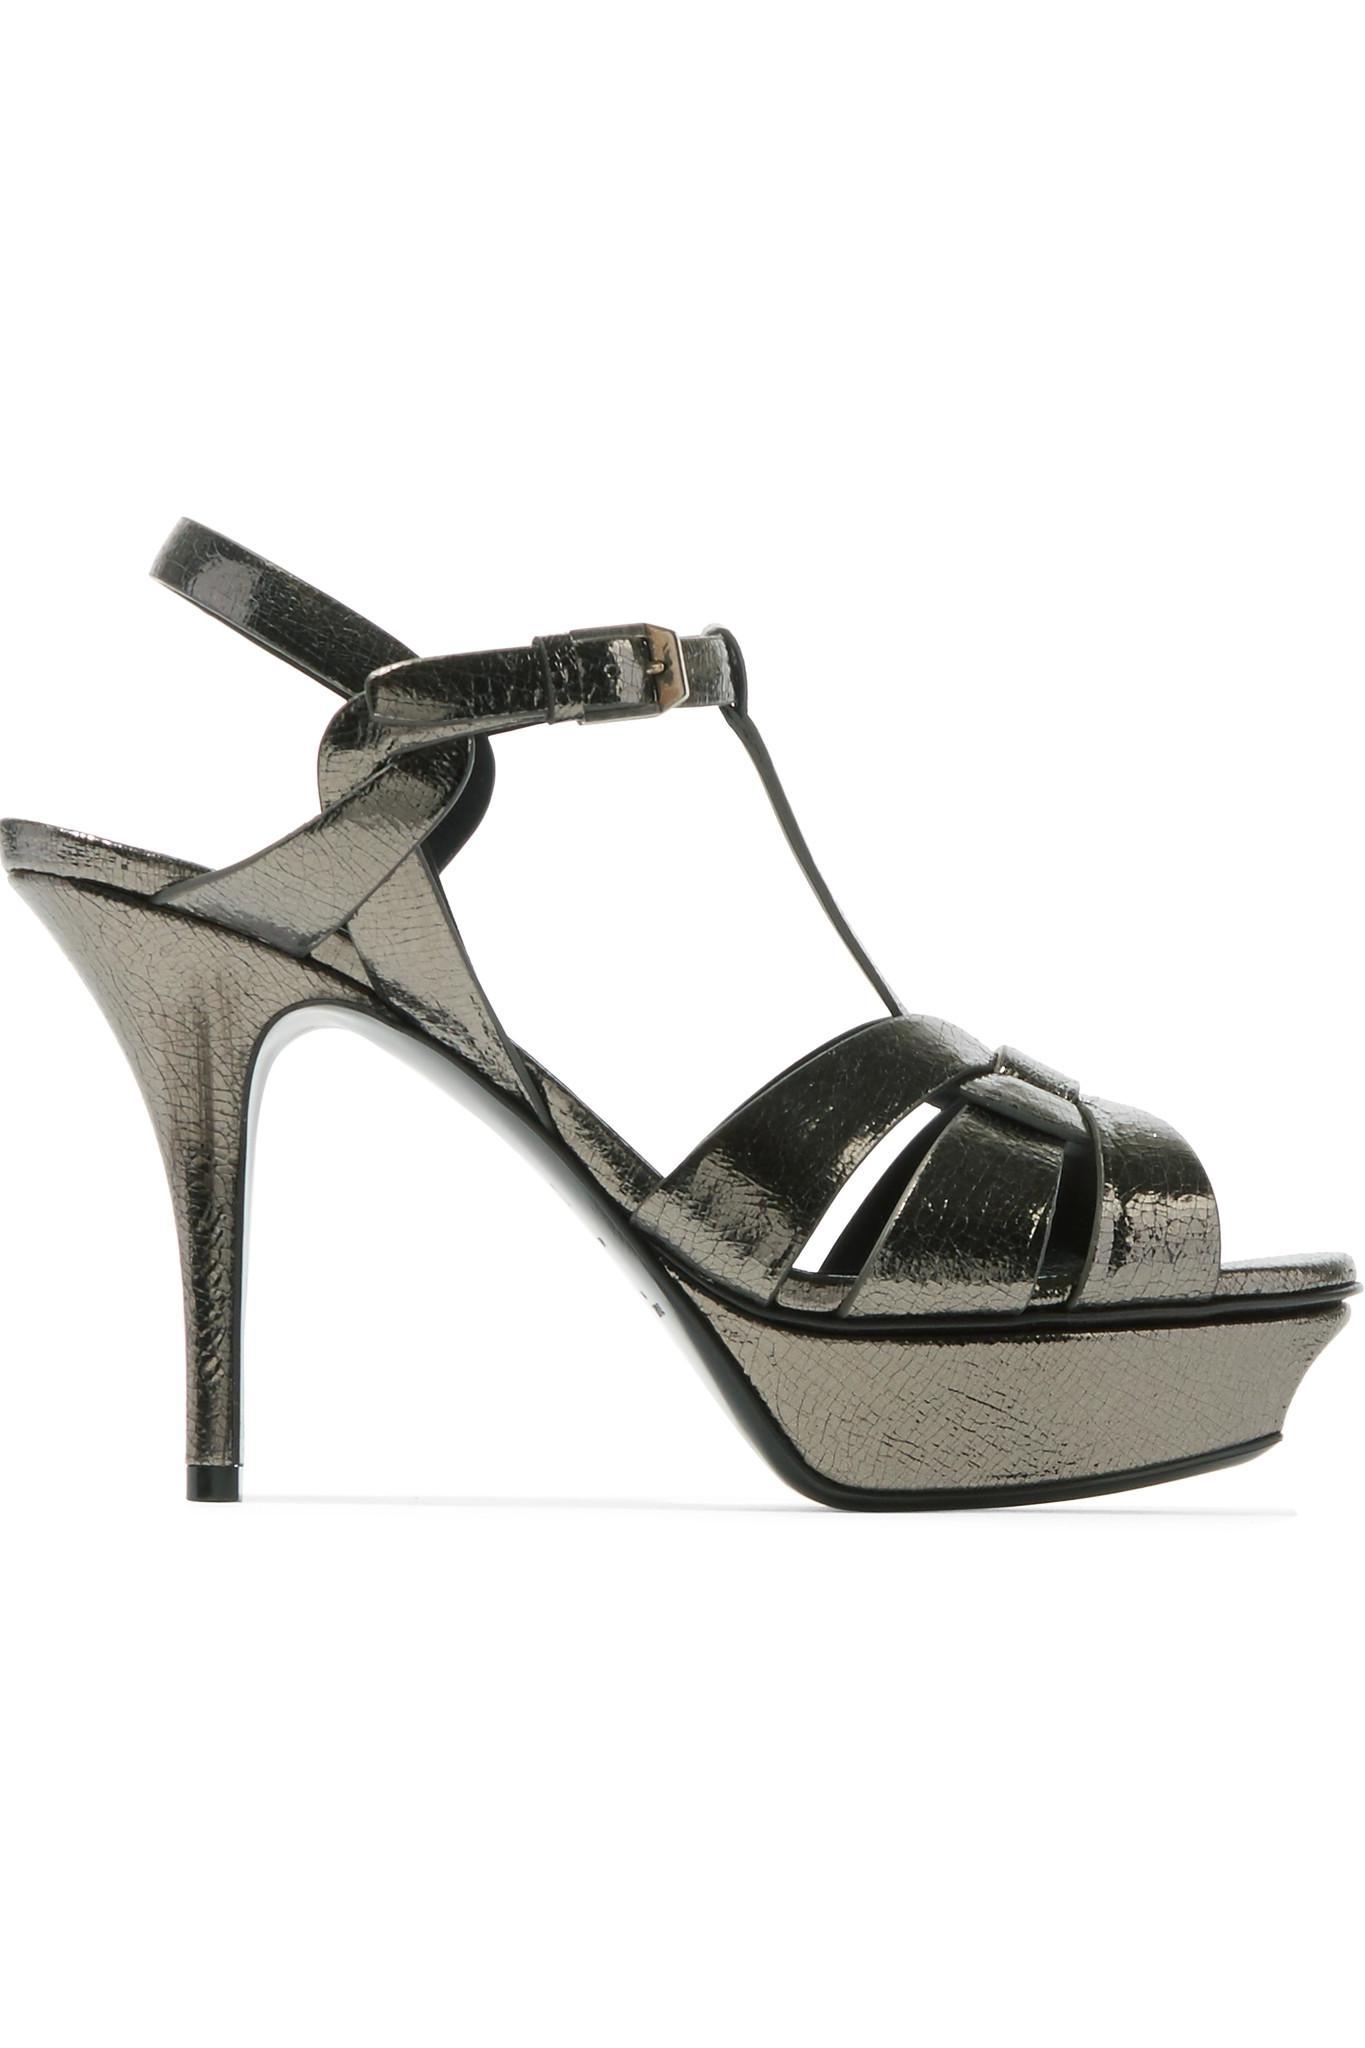 5db2701864ef6e Saint Laurent. Women s Black Tribute Metallic Cracked-leather Platform  Sandals